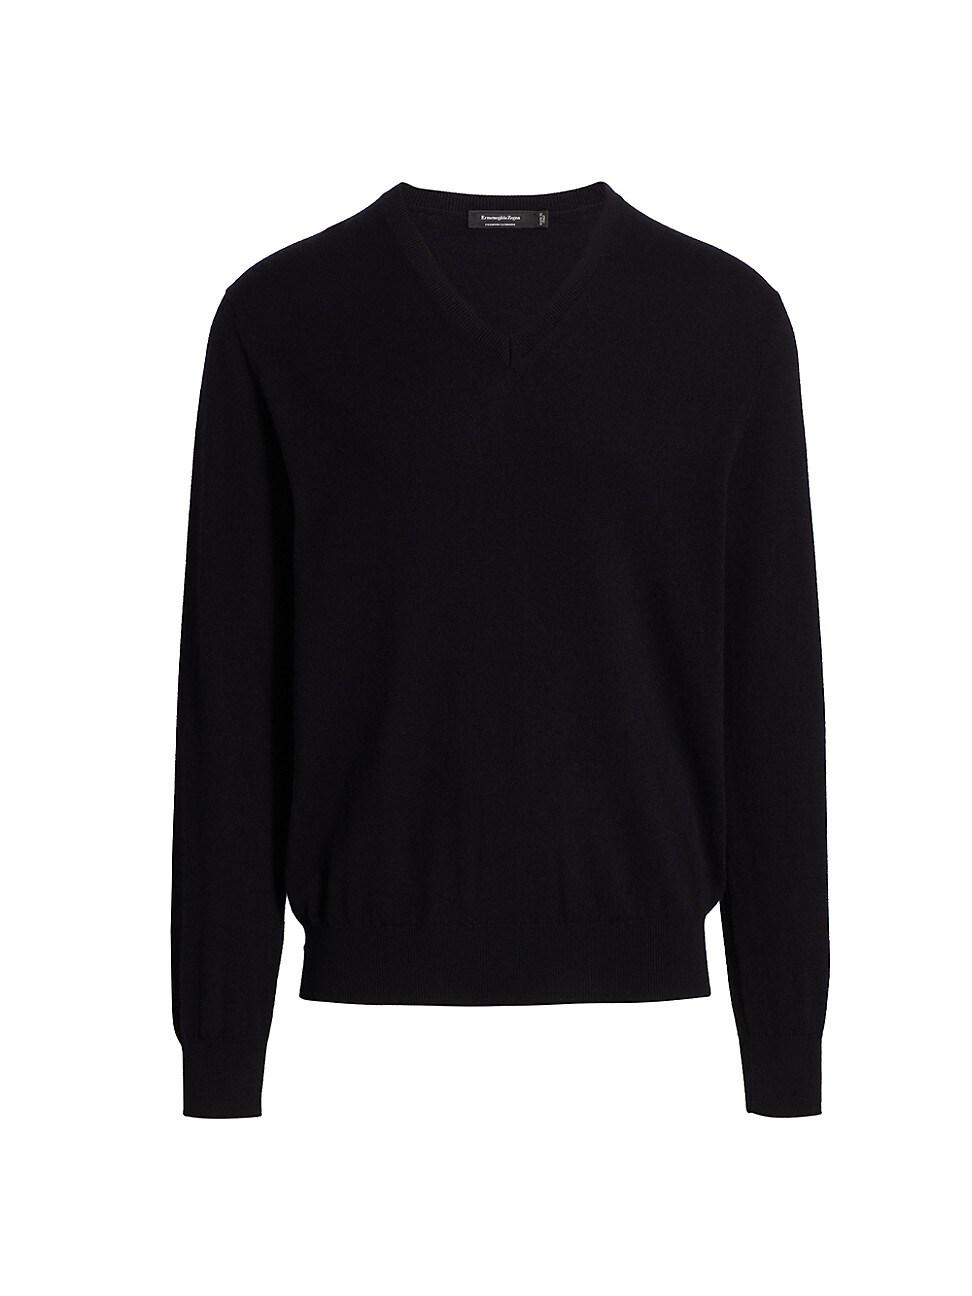 Ermenegildo Zegna Cashmere-silk Blend V-neck Sweater In Black